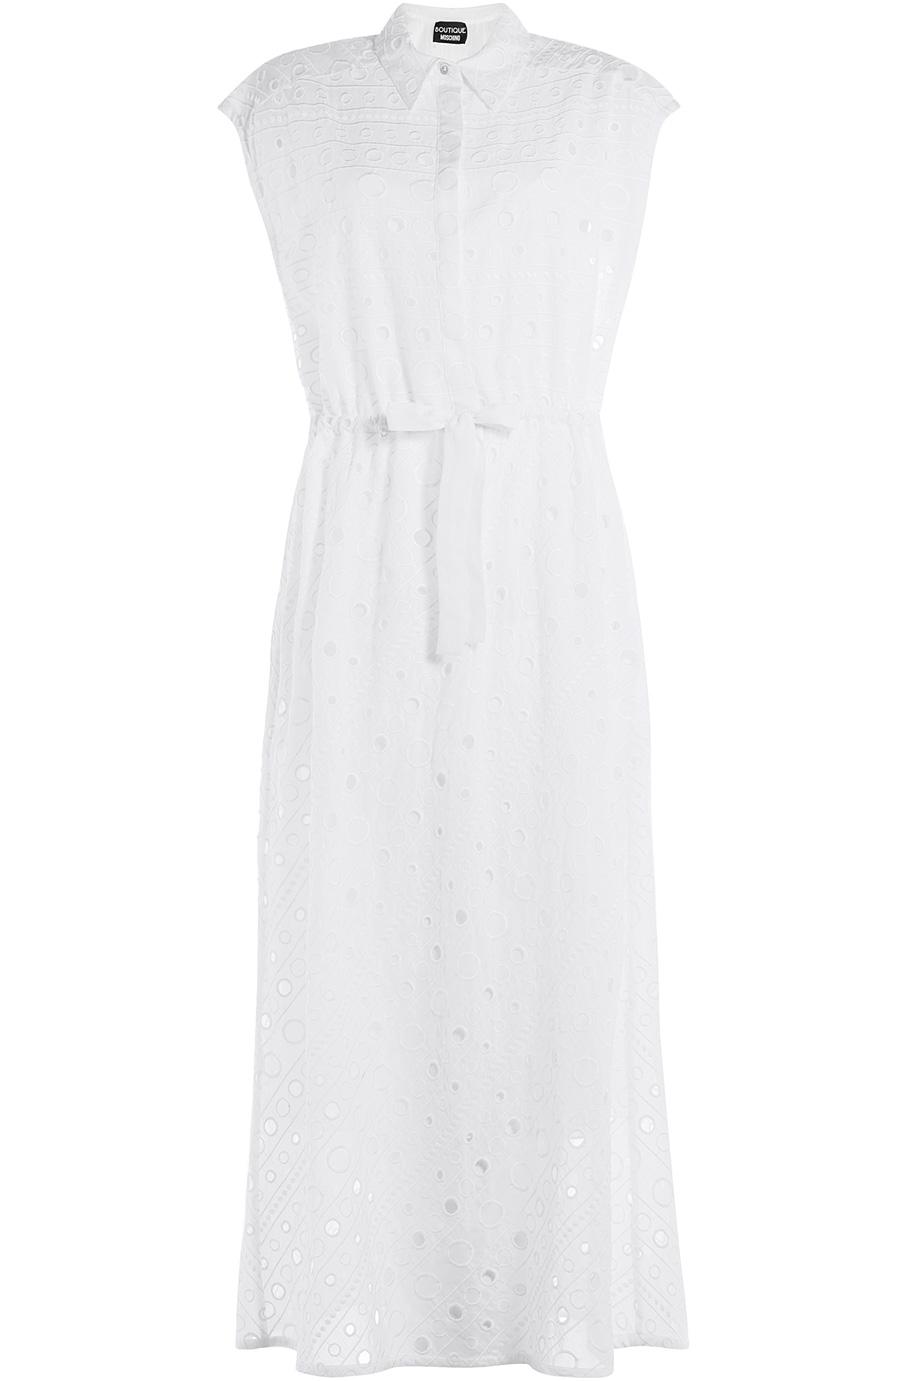 Boutique Moschino Cotton Maxi Dress In White